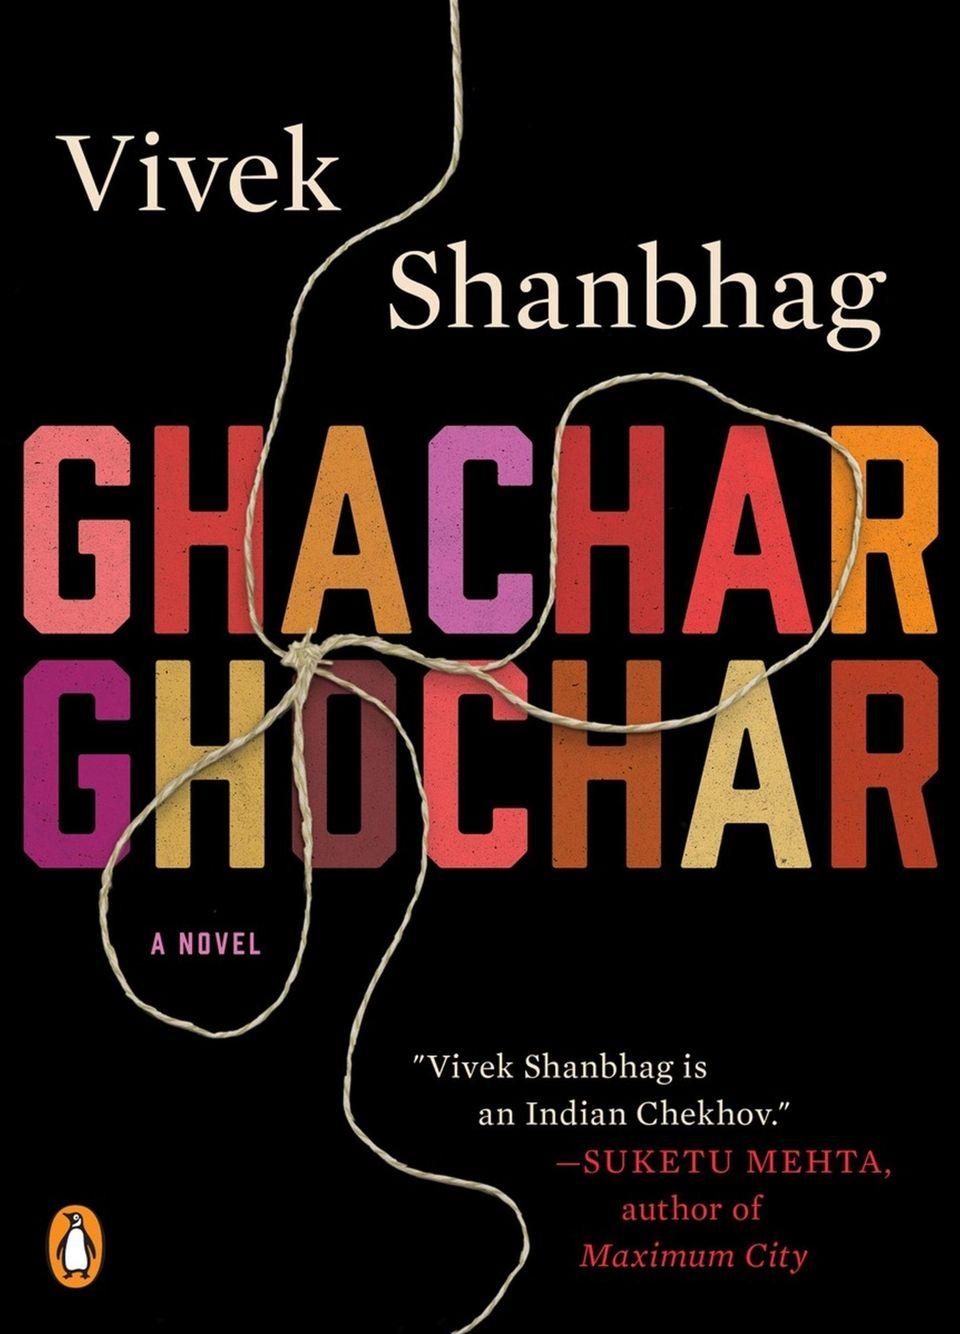 """Ghachar Ghochar"" by Vivek Shanbhag (Penguin, February 2017)"